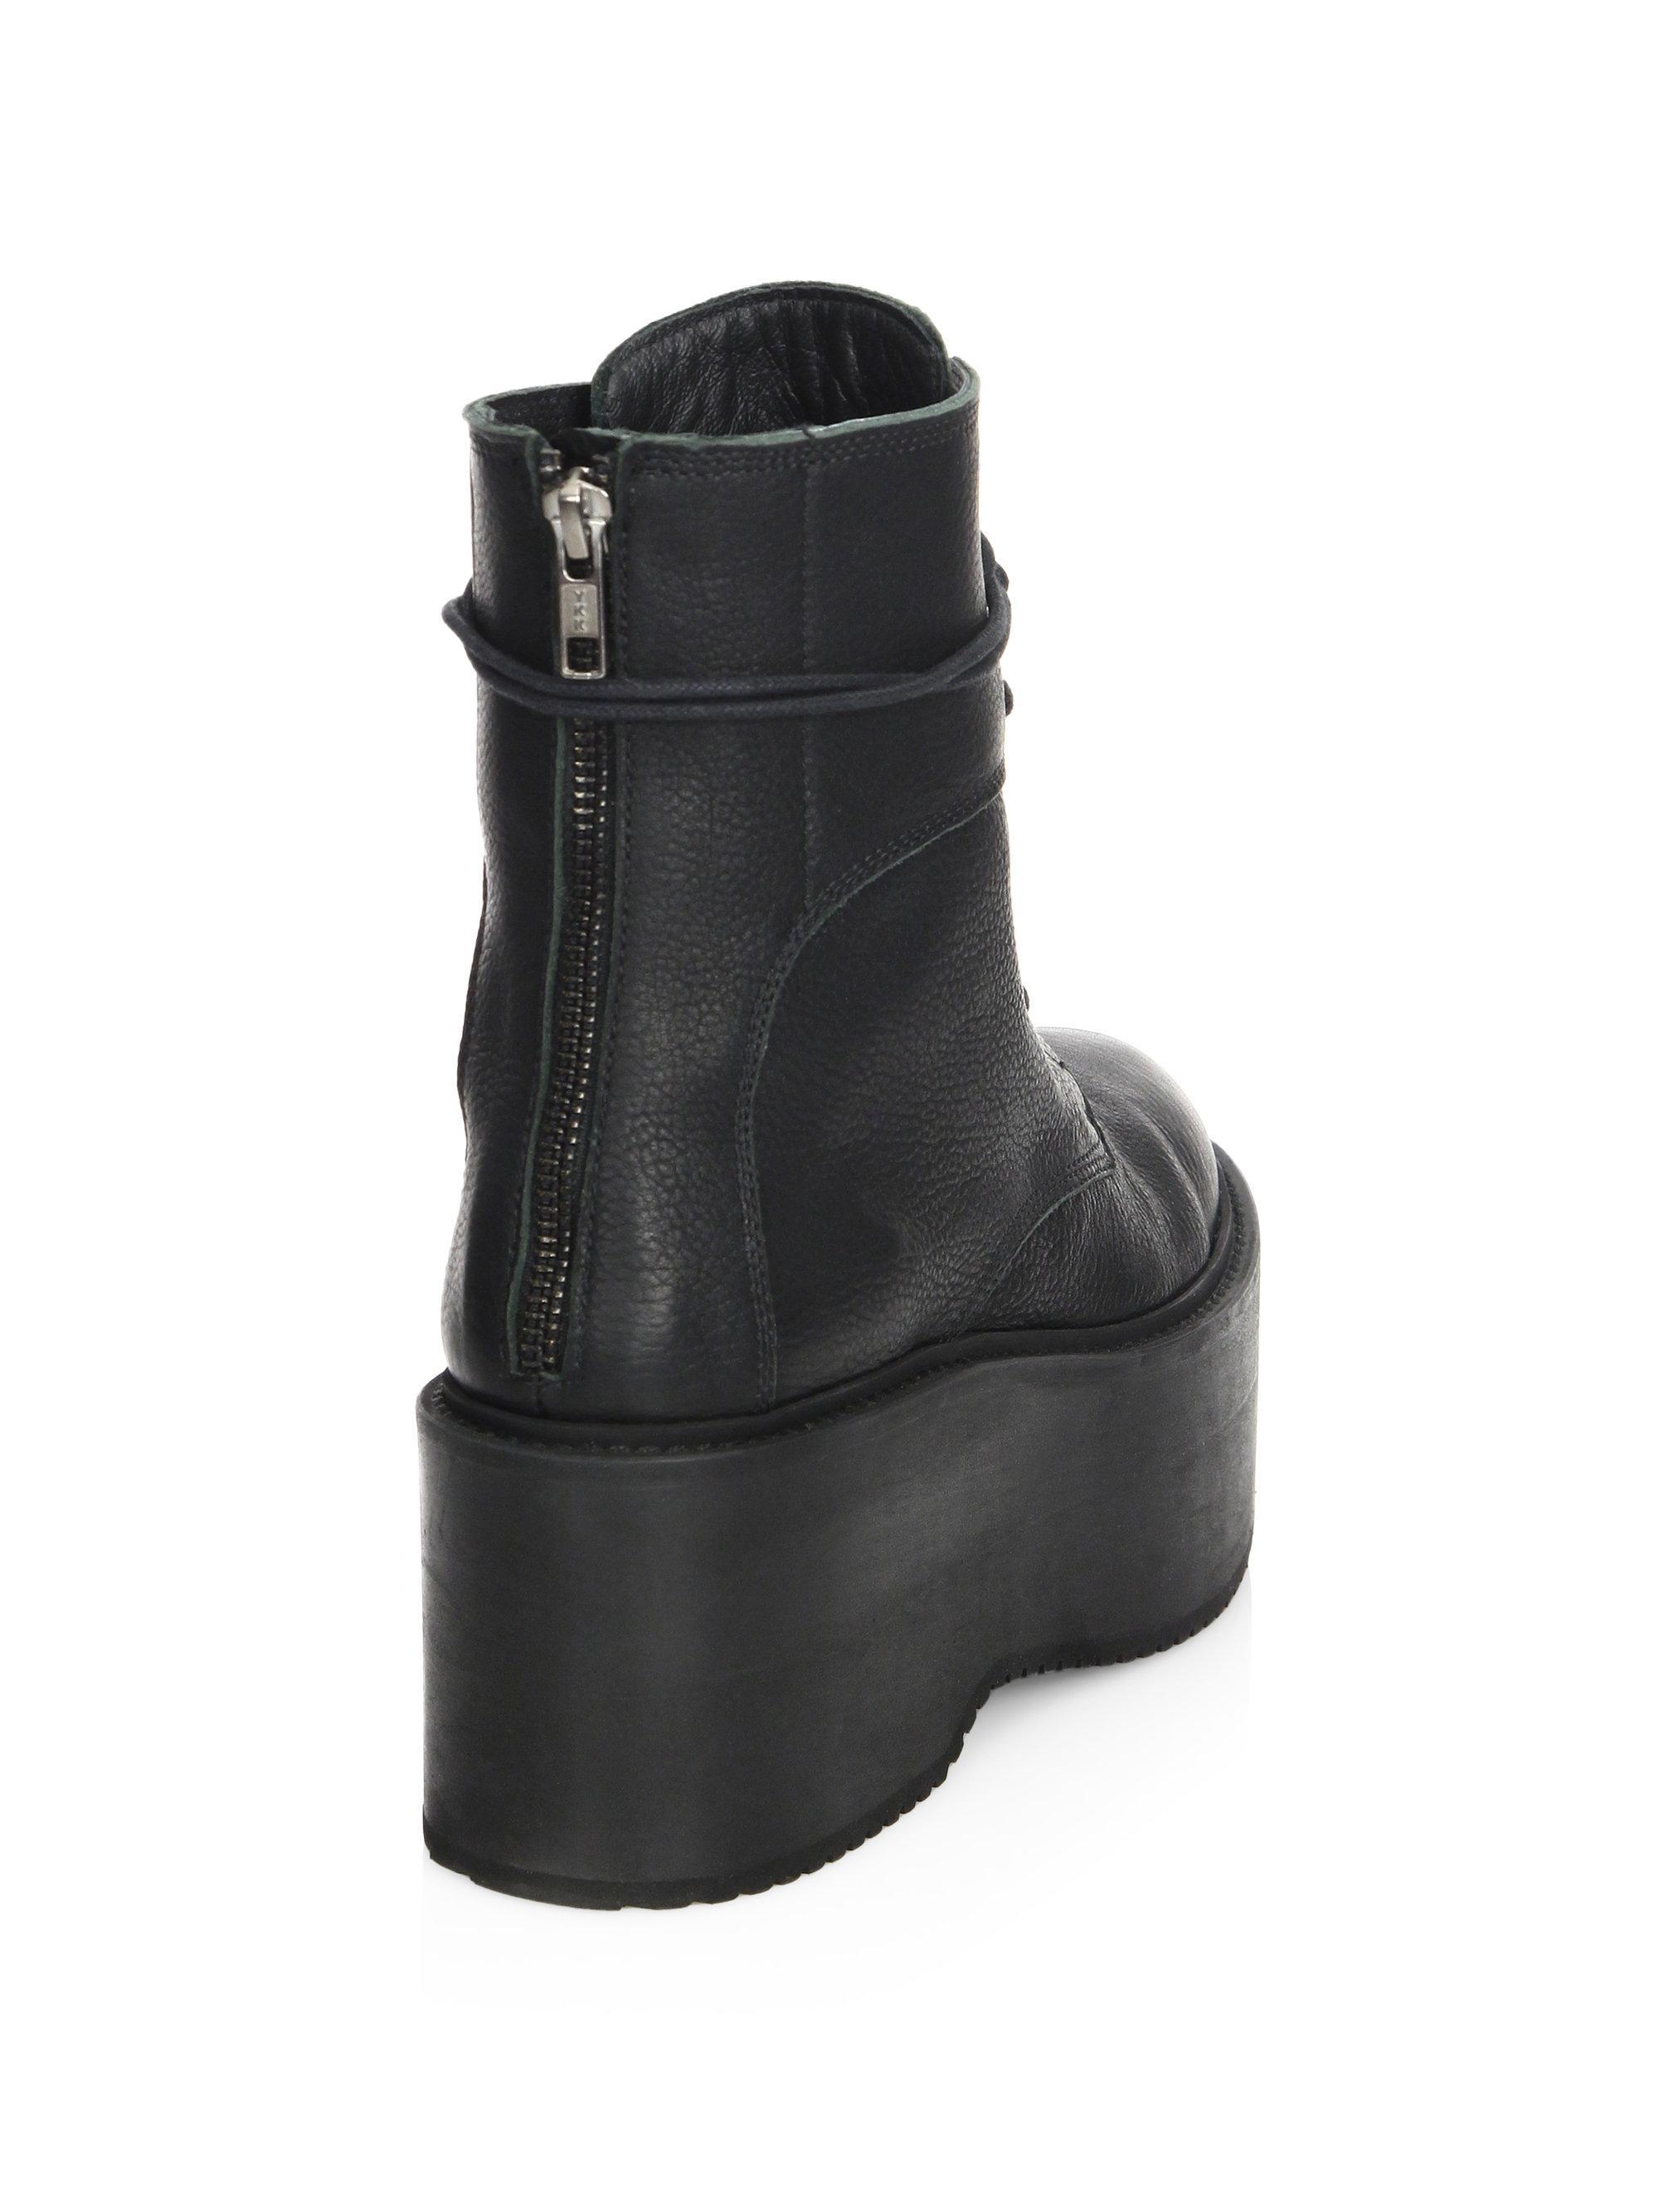 LD Tuttle The Plunge Leather Mid-Calf Platform Boots eJythr3tr1